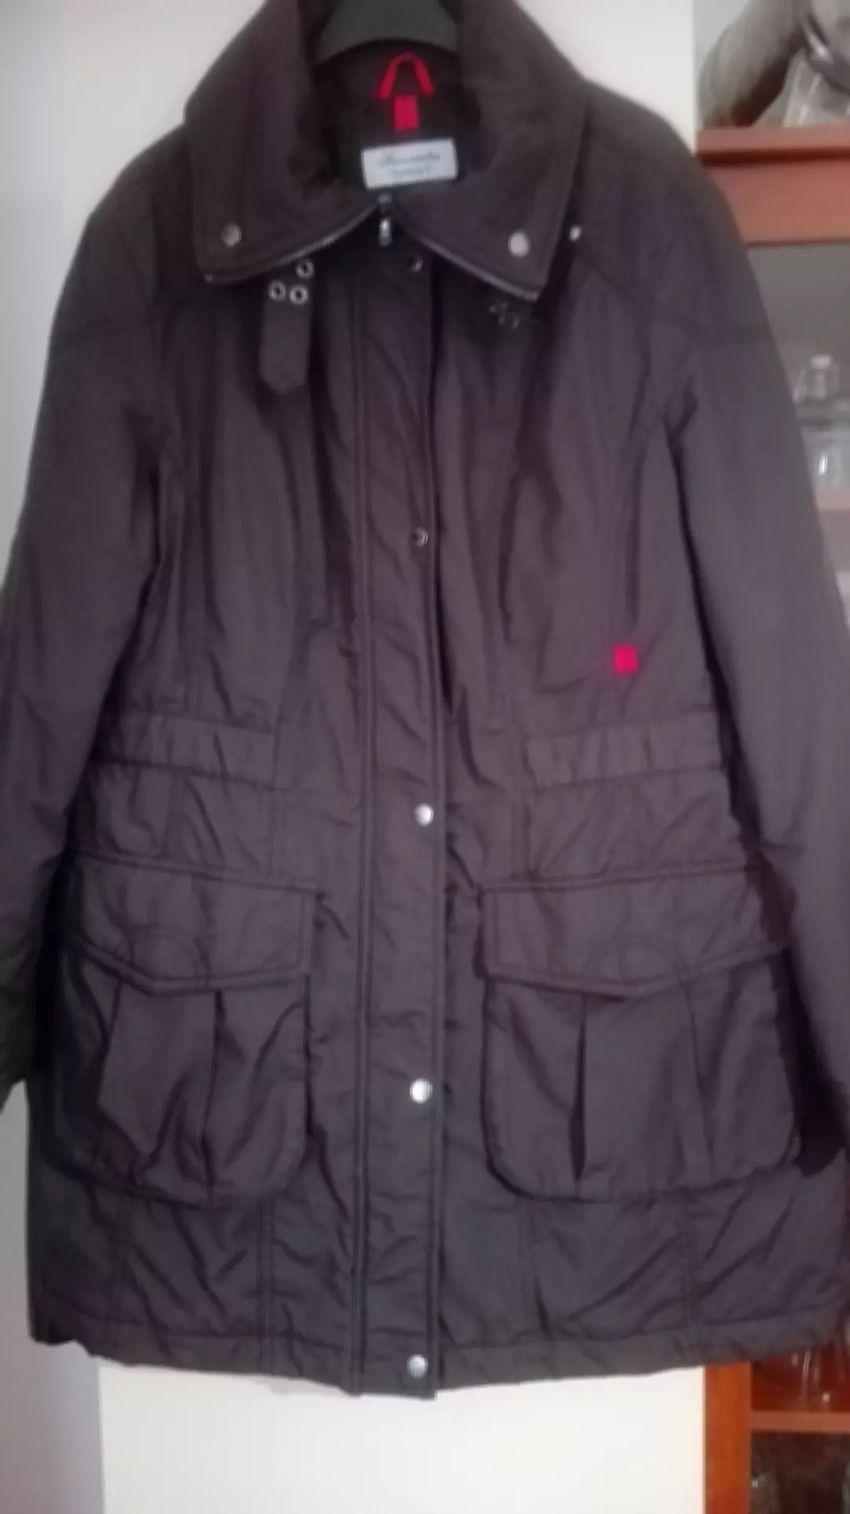 Zenska jakna 44br 0